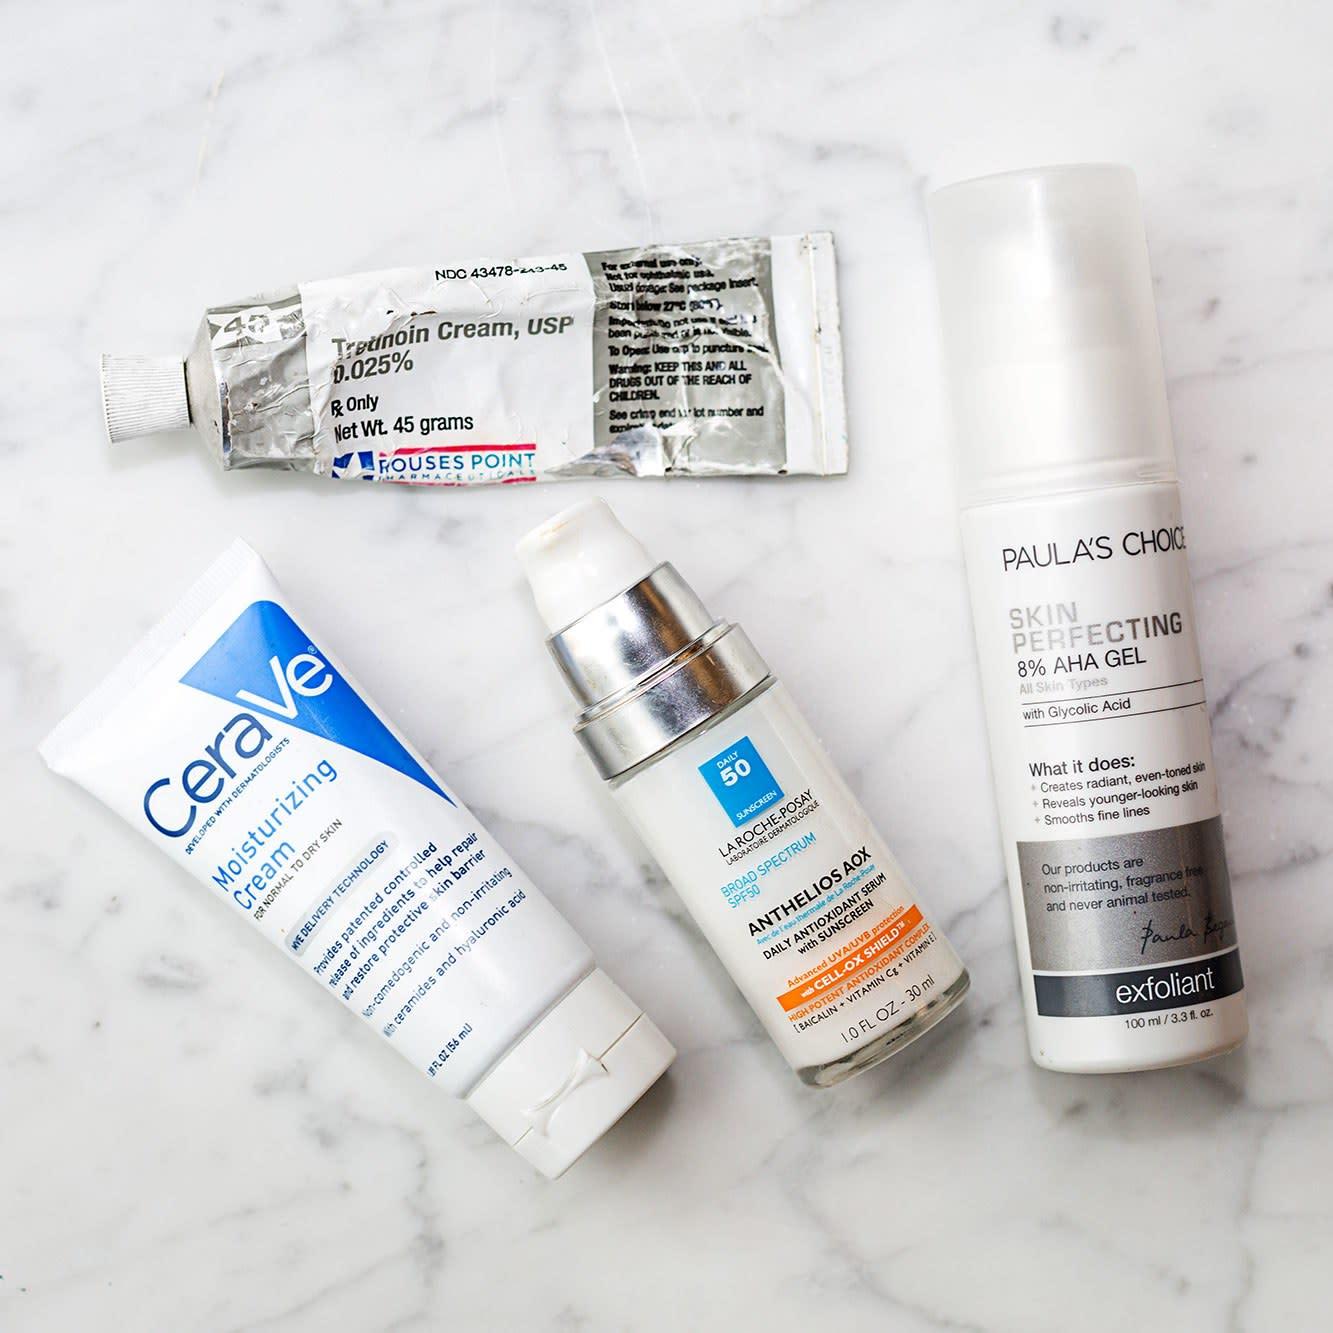 Scar Retreat Cream Serum.How Easing Into Retinol Led To My Best Skin Ever